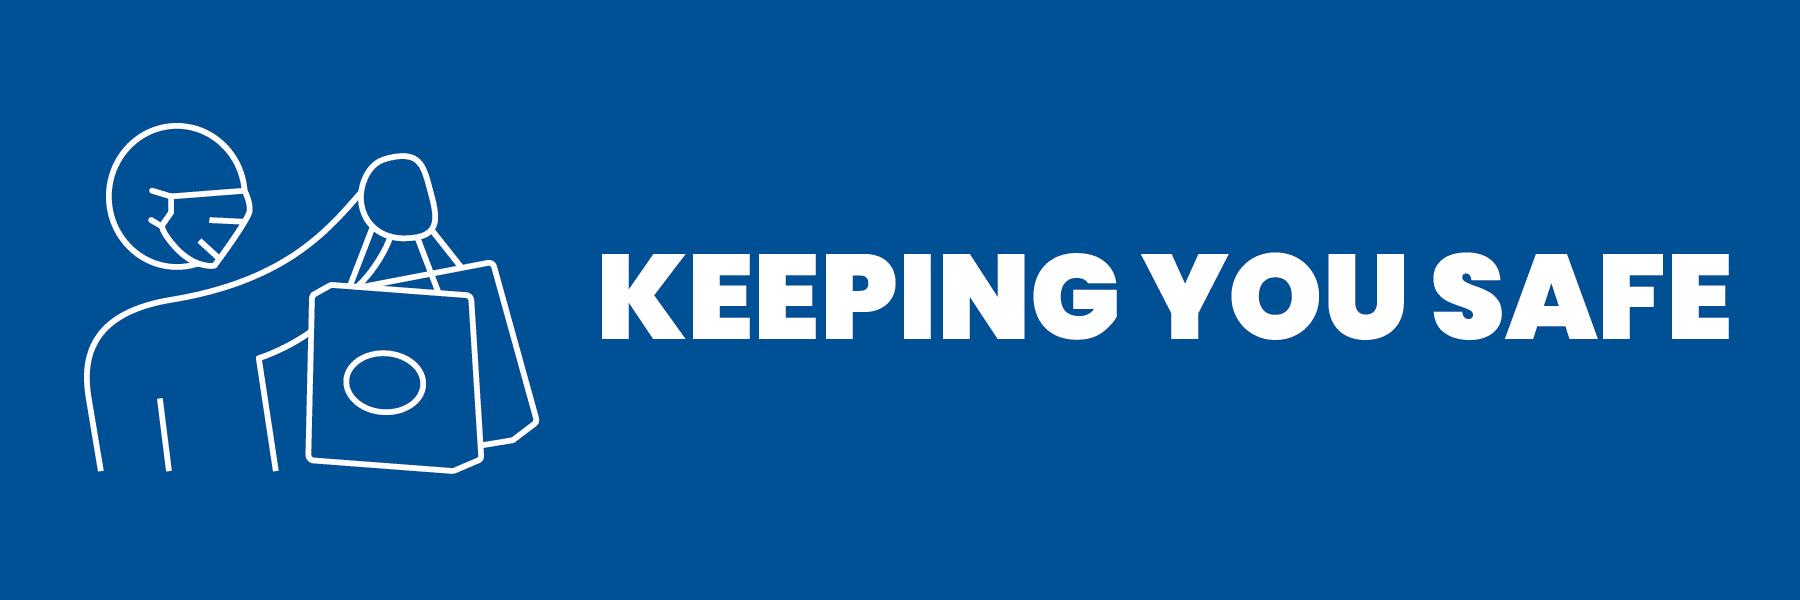 KEEPING YOU SAFE. FAQ's